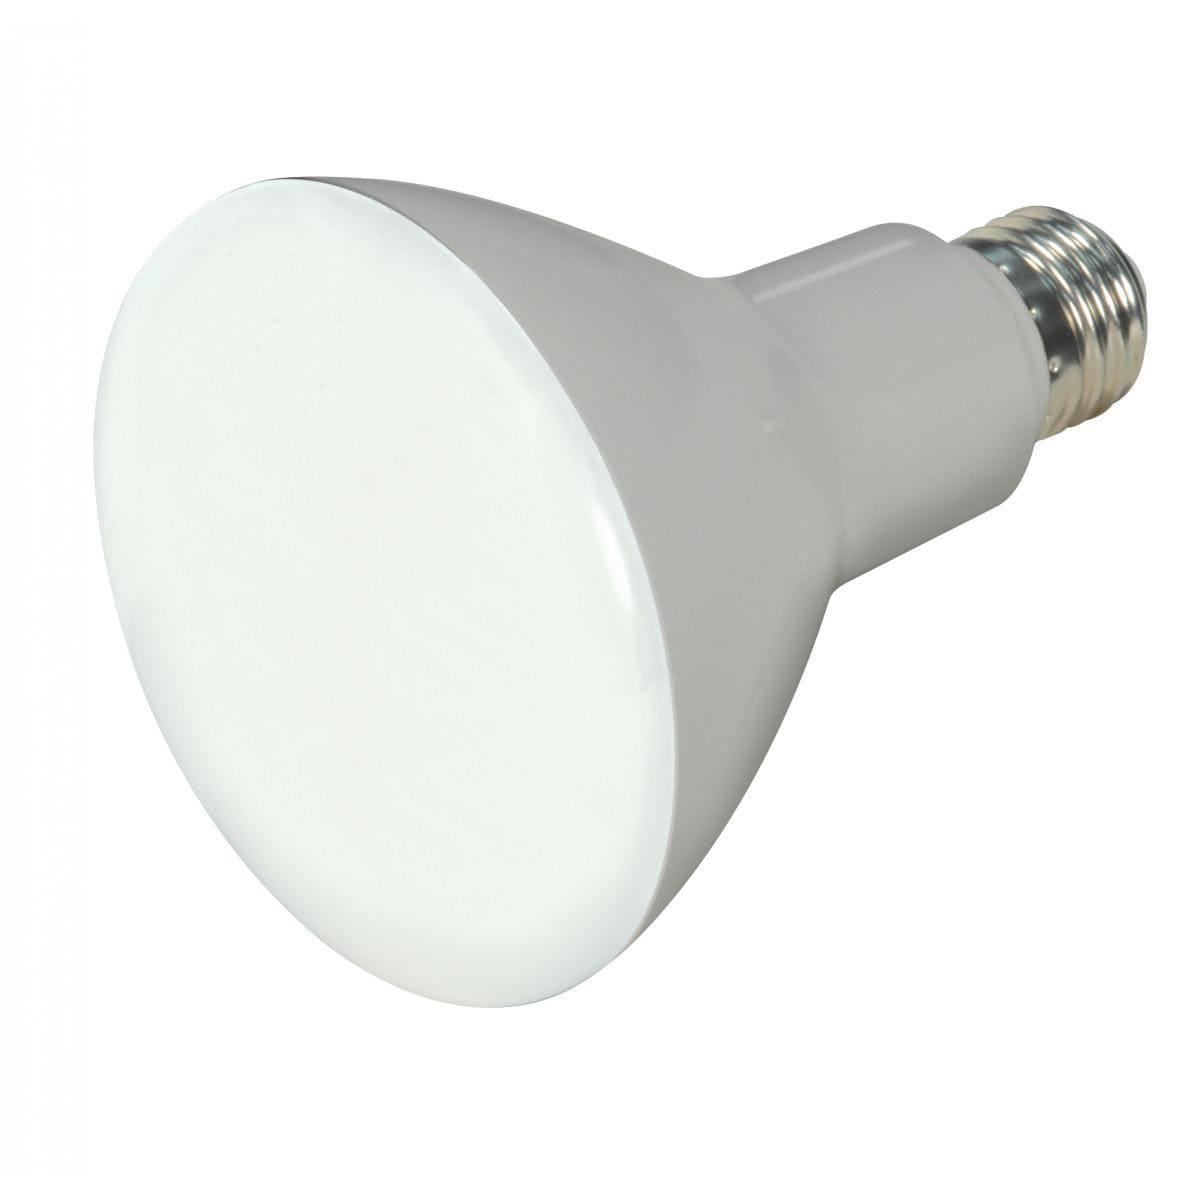 SATCO 9.5W LED BR30 Reflector - 105' Beam Spread - Medium...